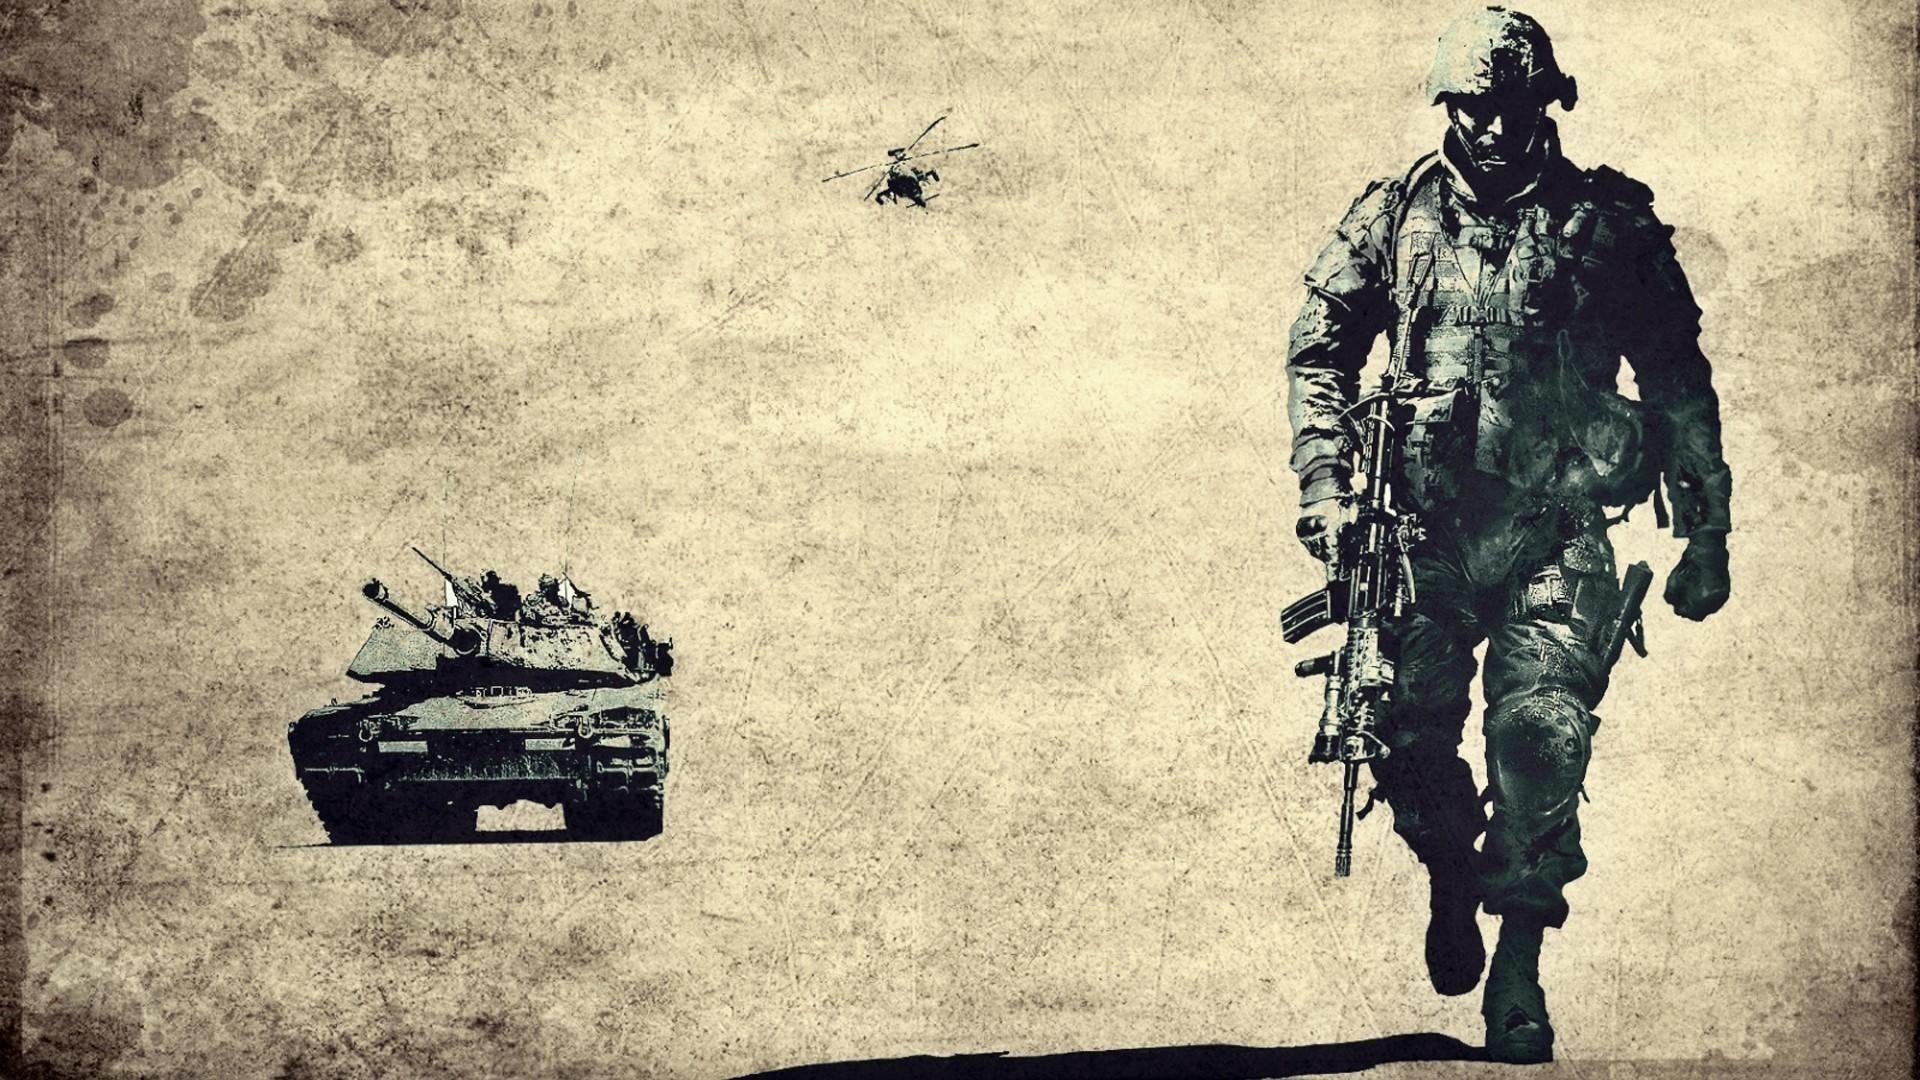 2560x1701 Army Ranger Wallpaper